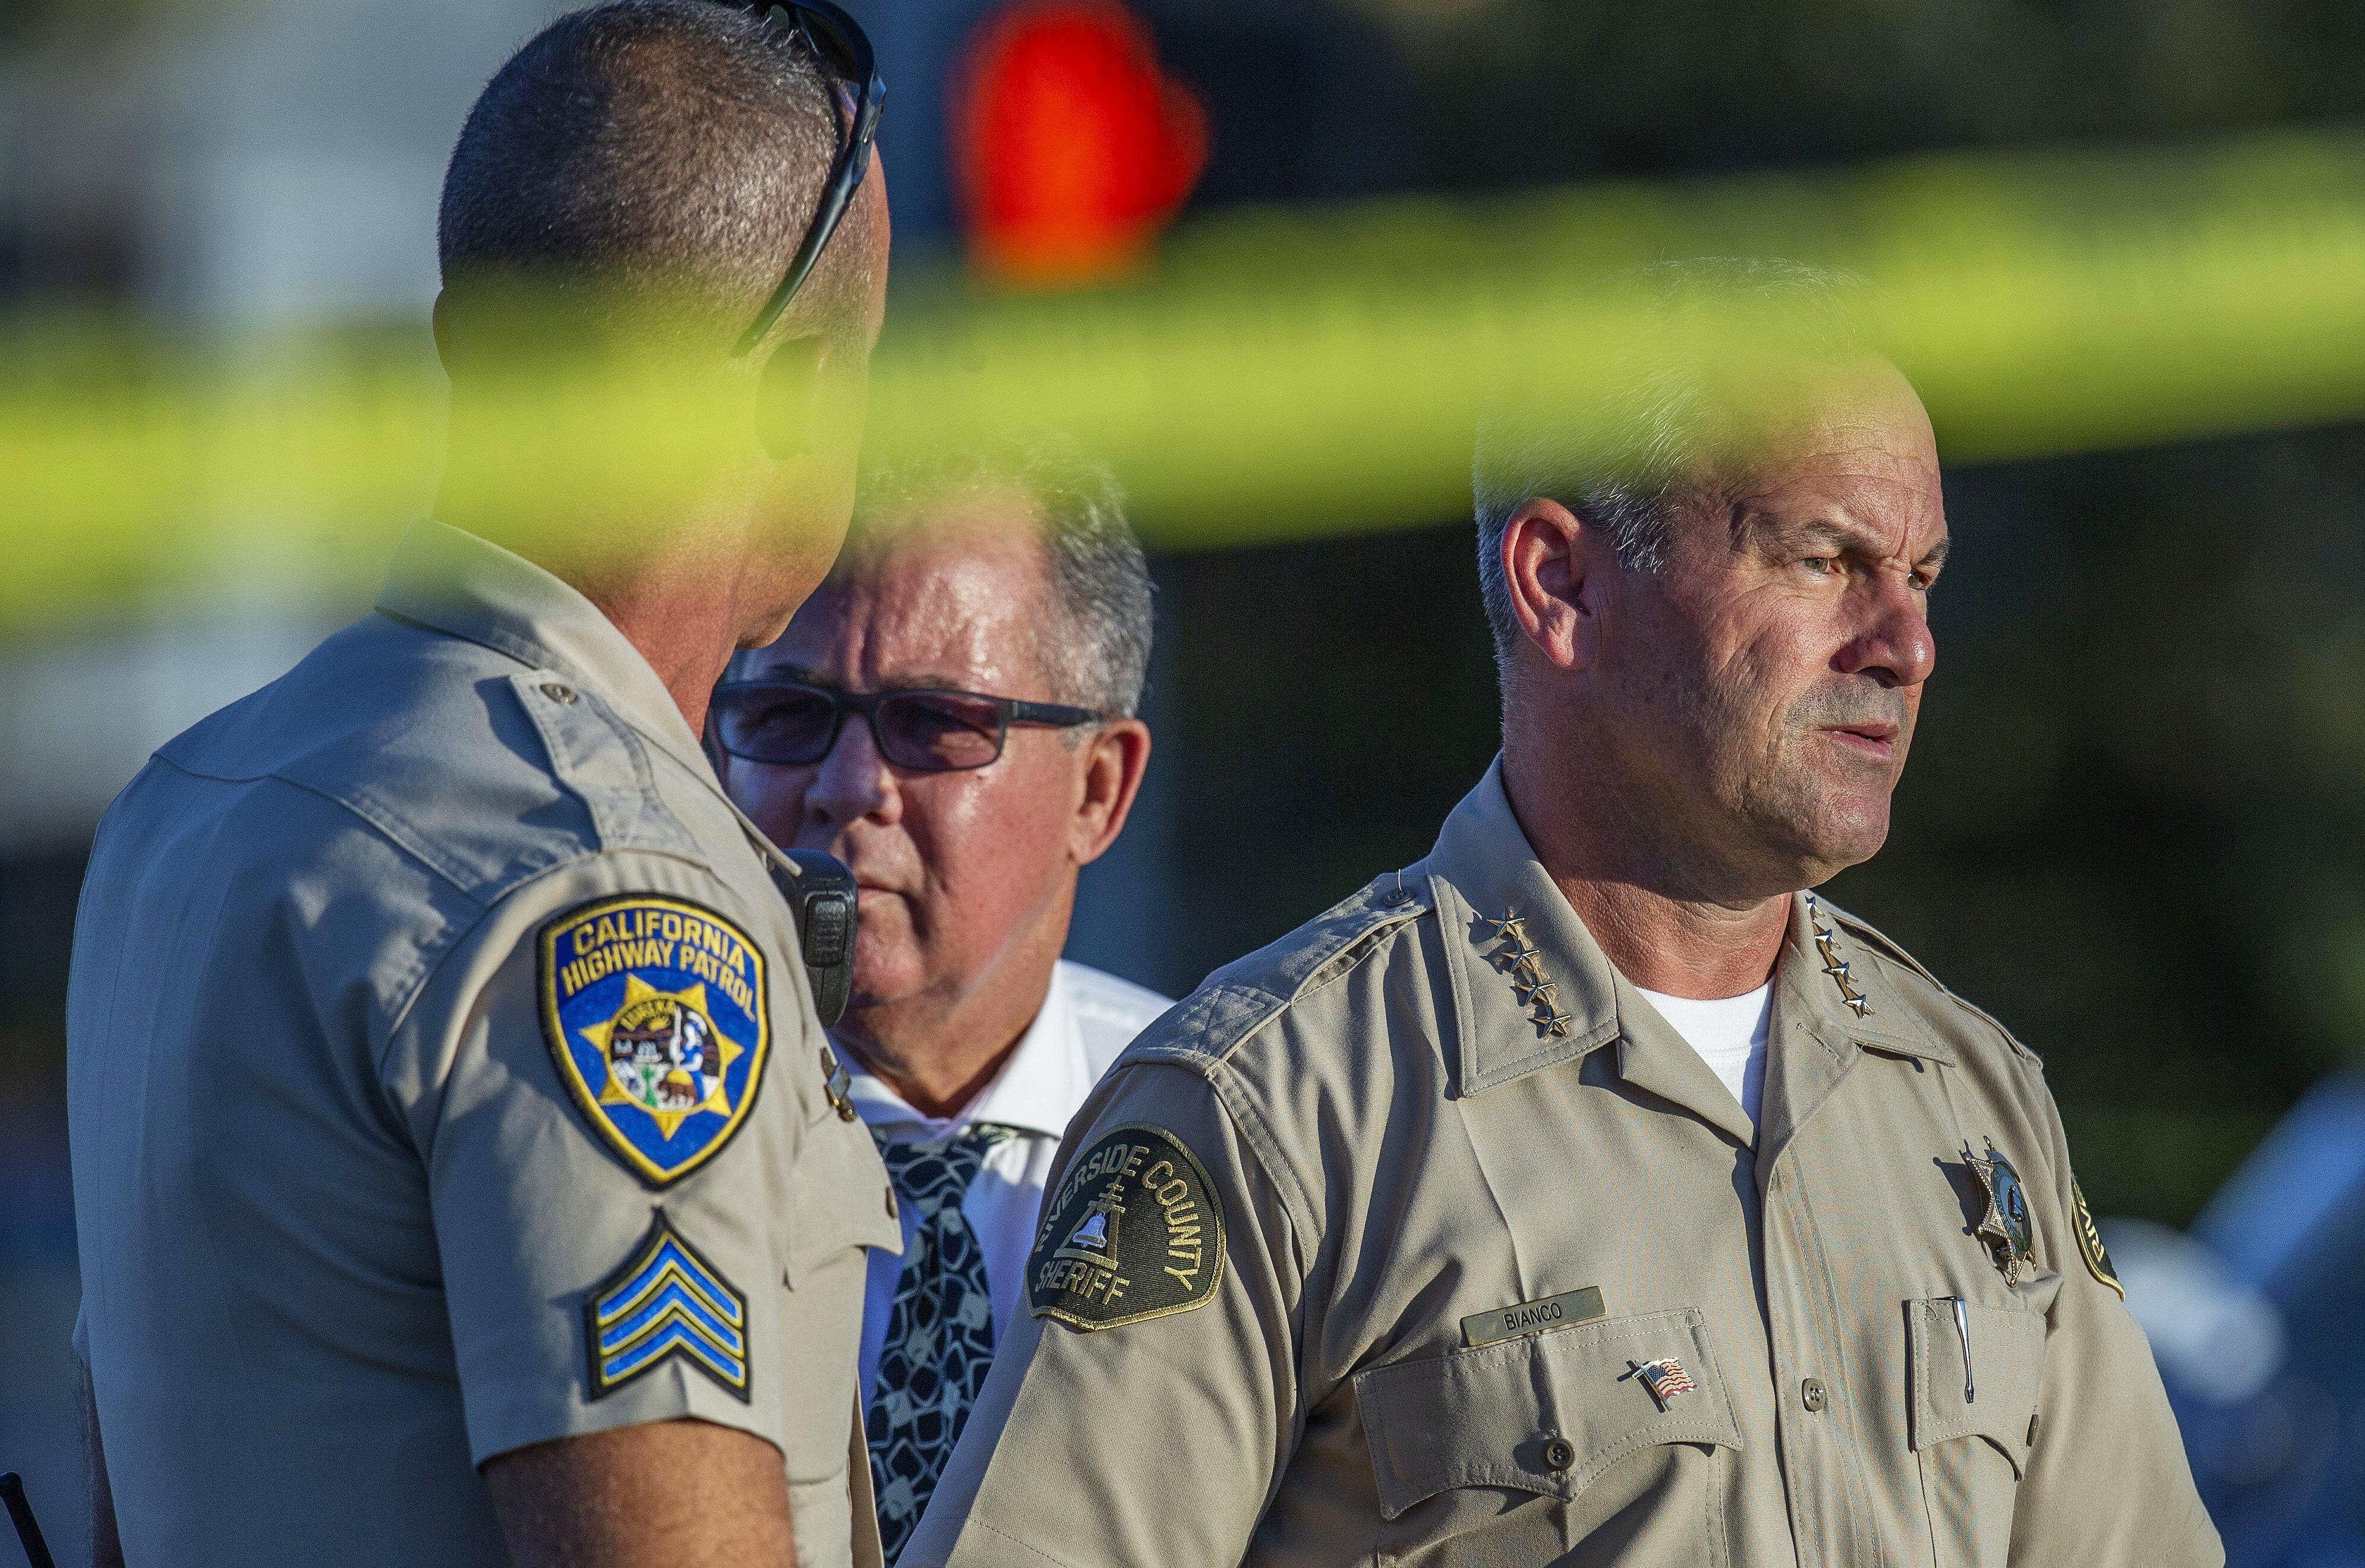 Wild California freeway shootout leaves officer, gunman dead